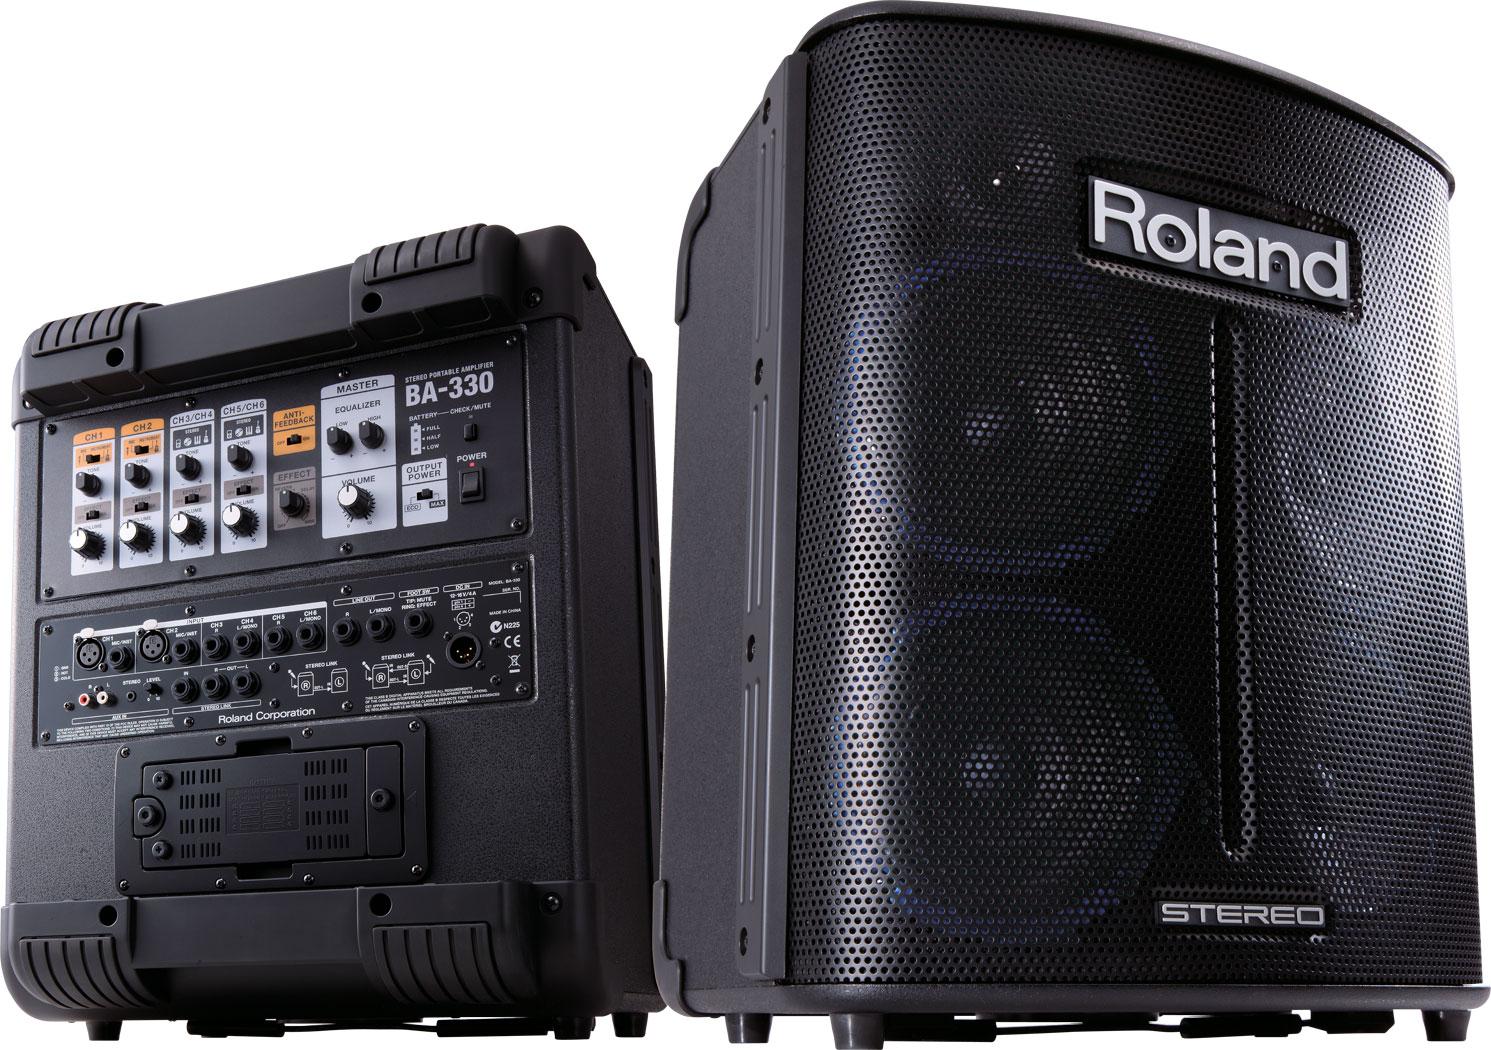 Roland罗兰 BA-330音箱